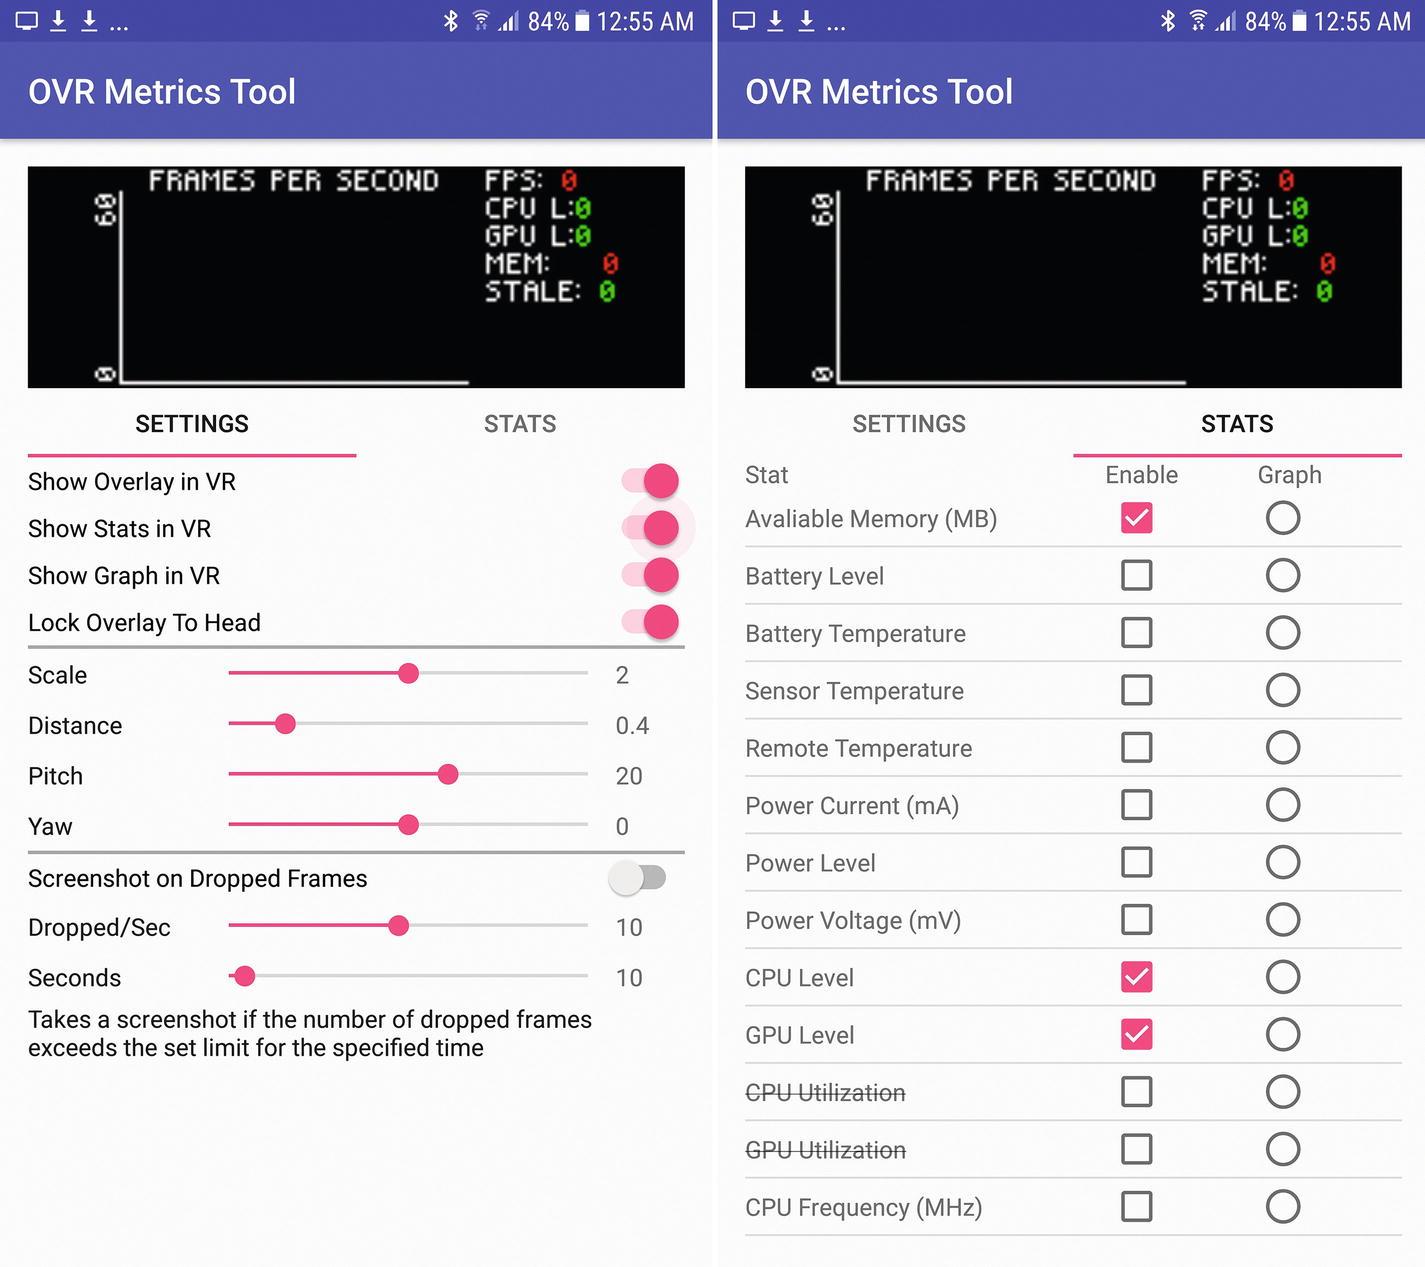 Performance, Profiling, and Optimizations | SpringerLink